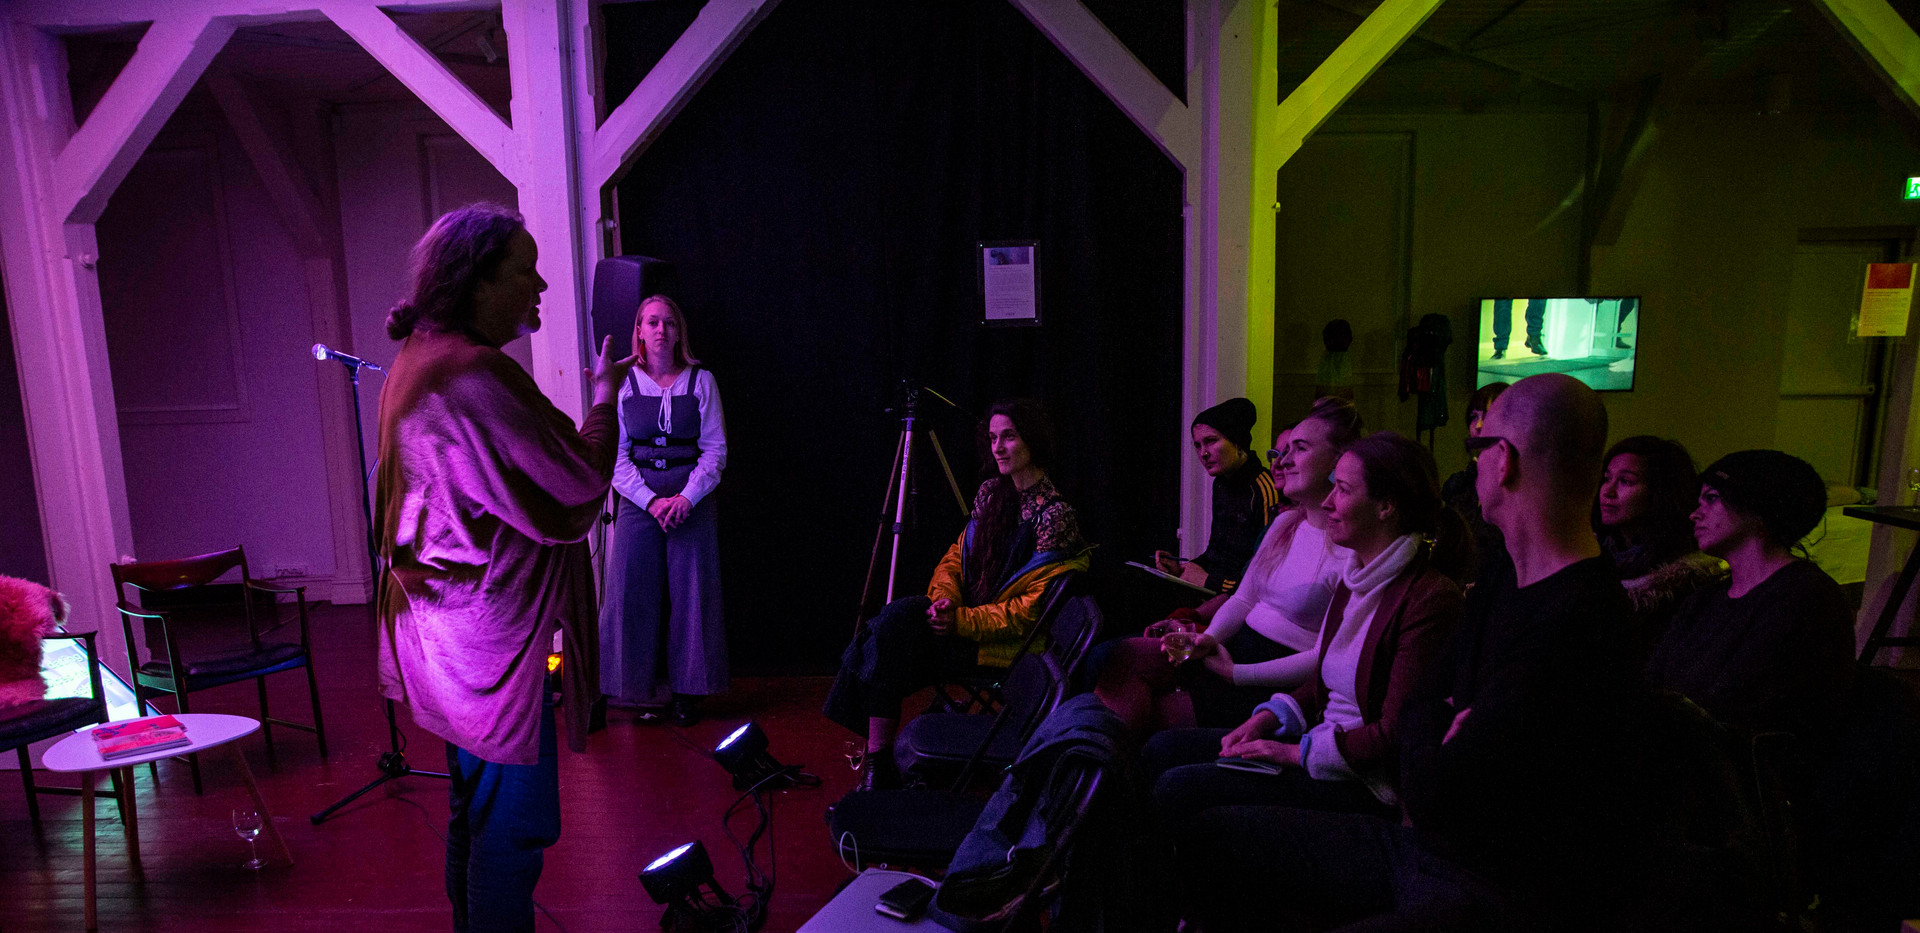 Kristin Bergaust + audience nov 2019.JPG